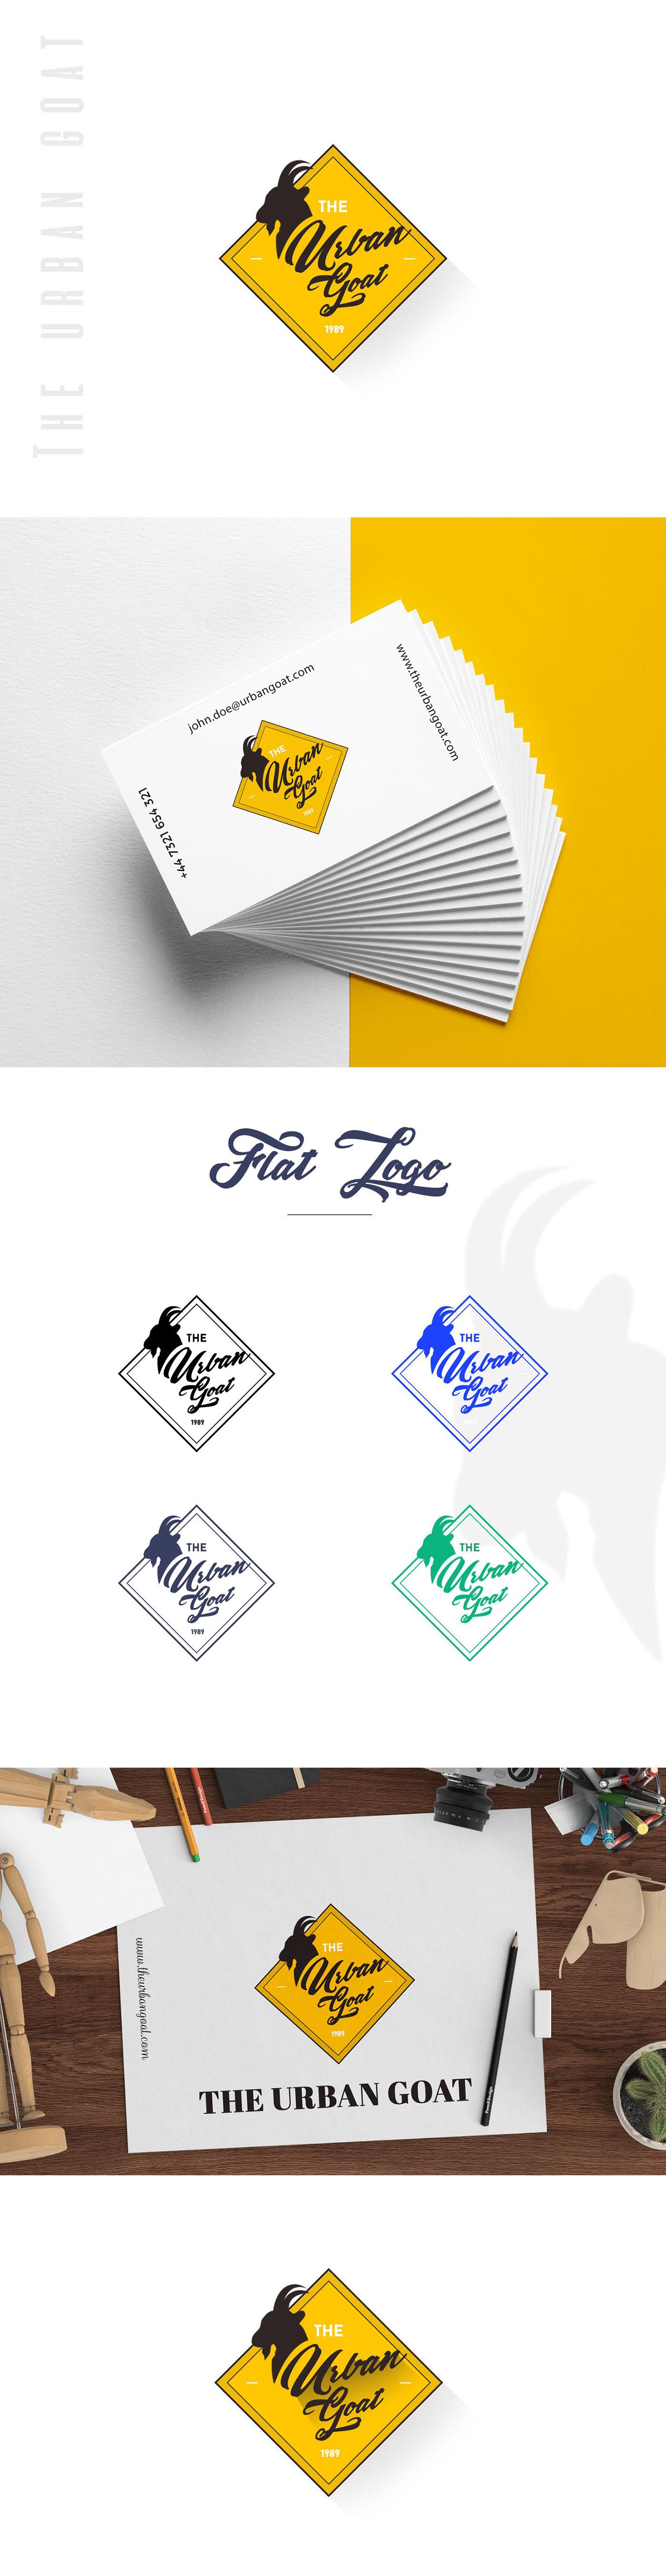 logo yellow logodesign UI ux branding  digital design design studio evalogical urban goat